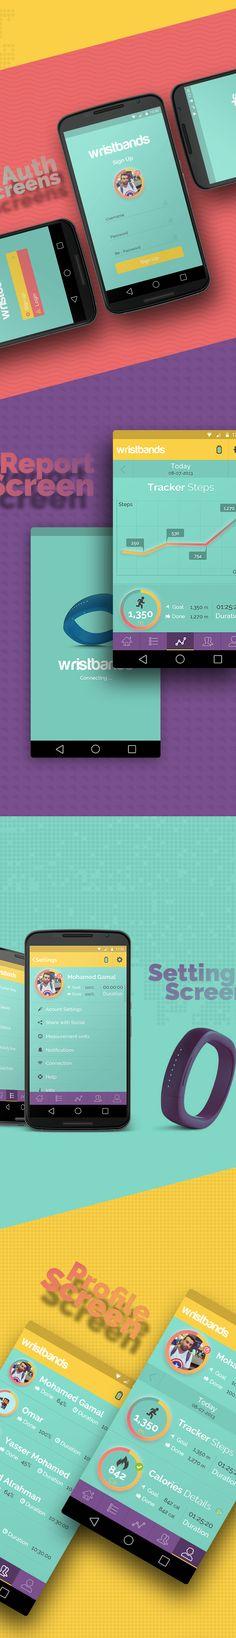 Wristband App